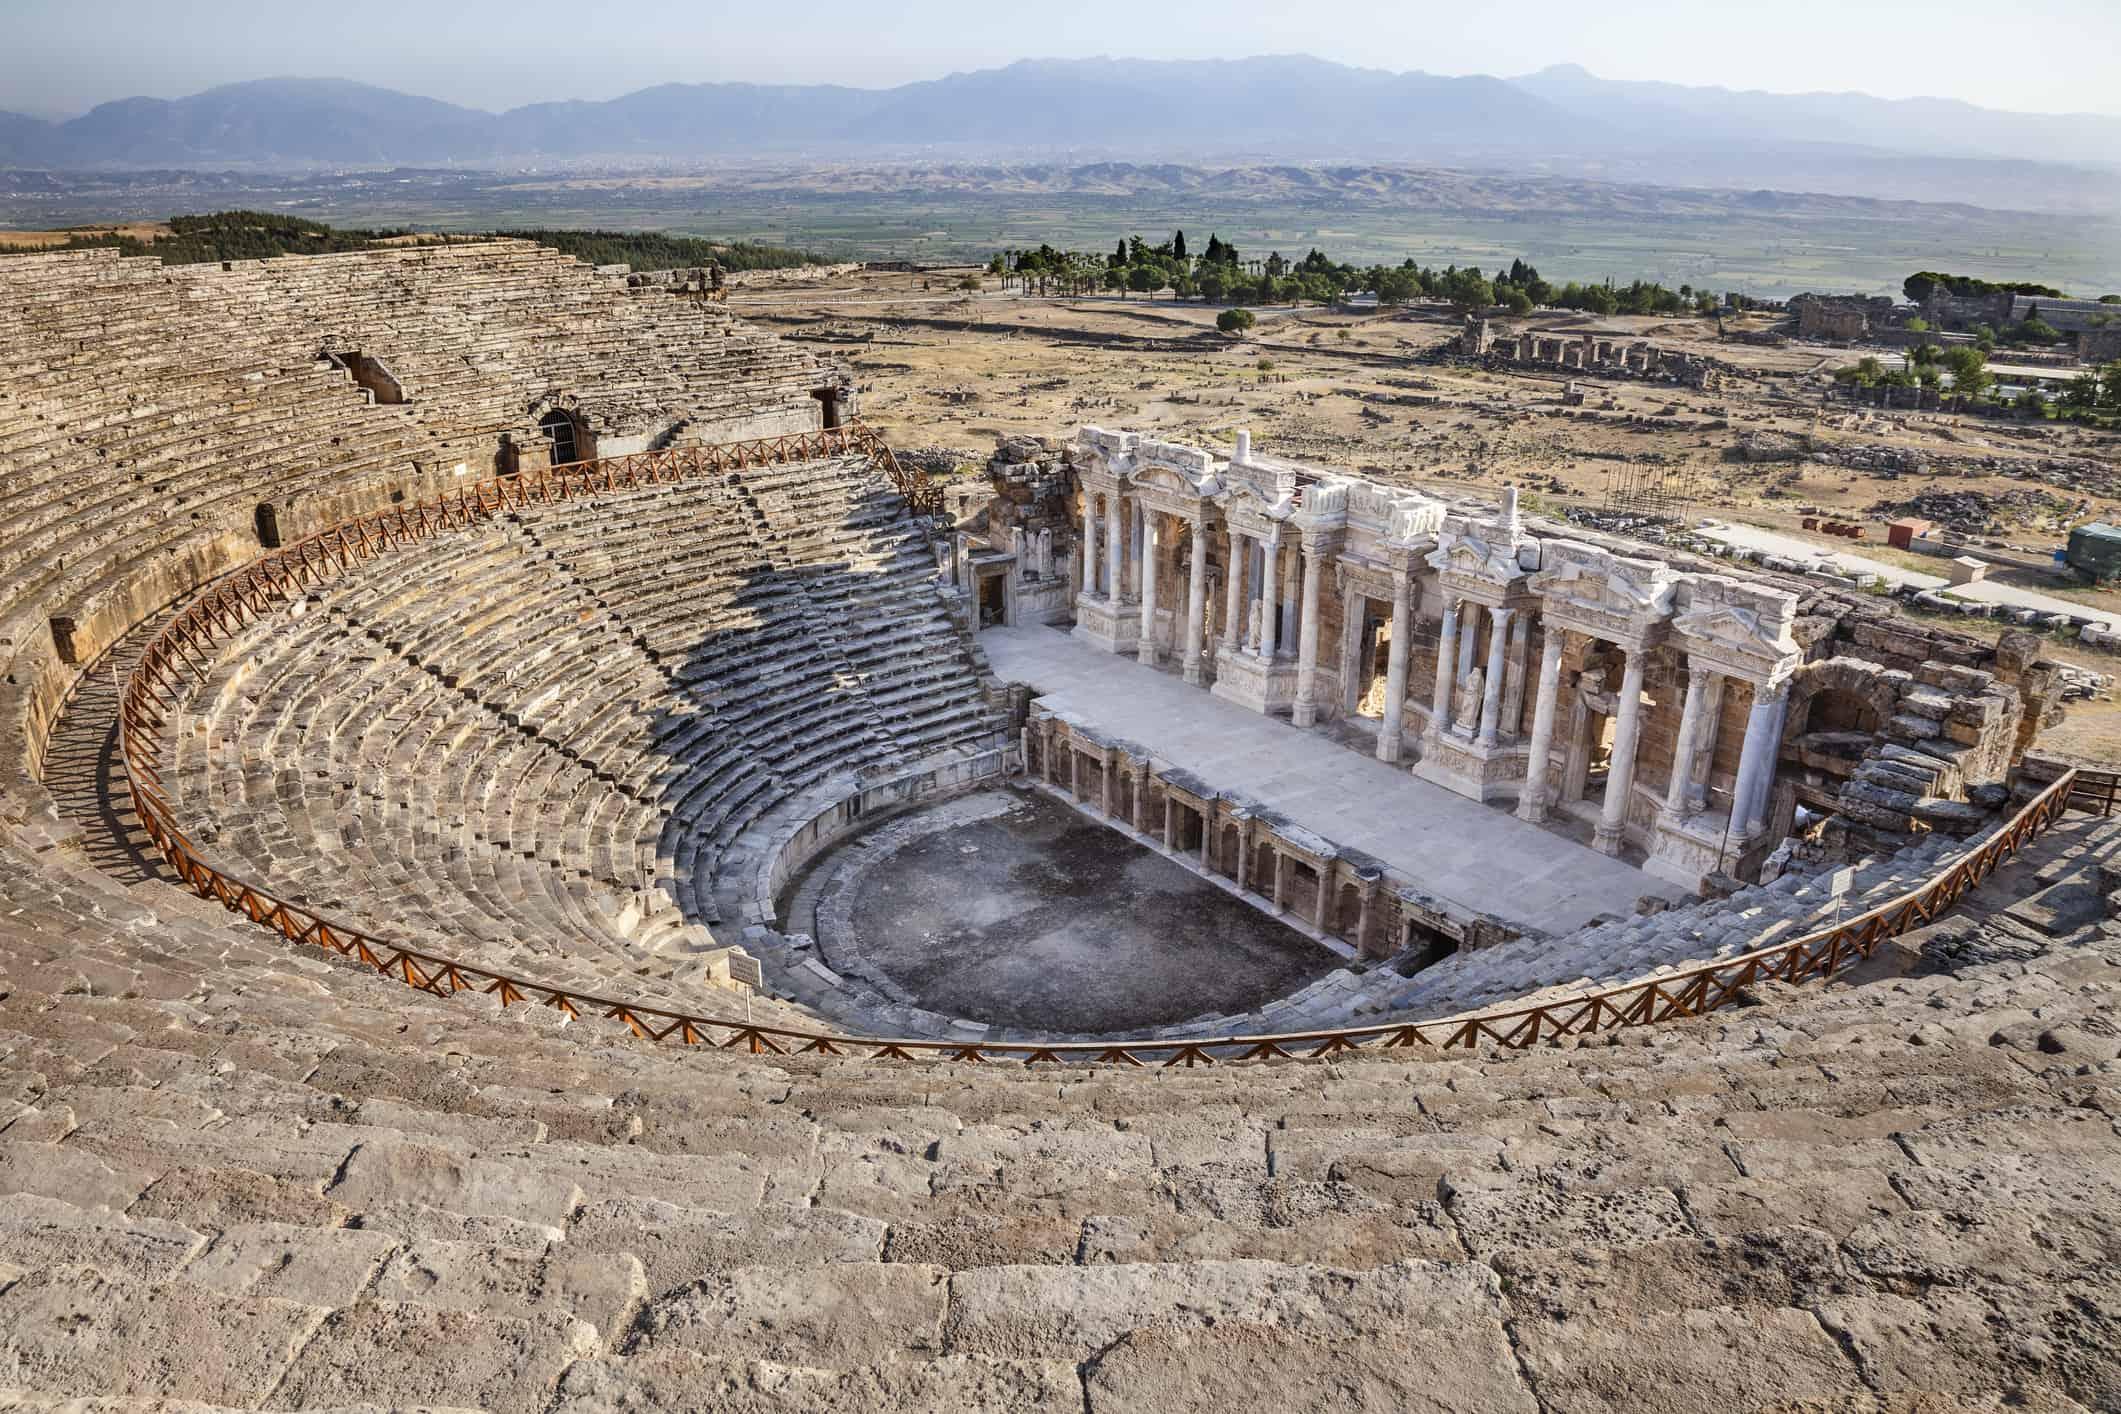 Roman amphitheatre in Hierapolis, Turkey